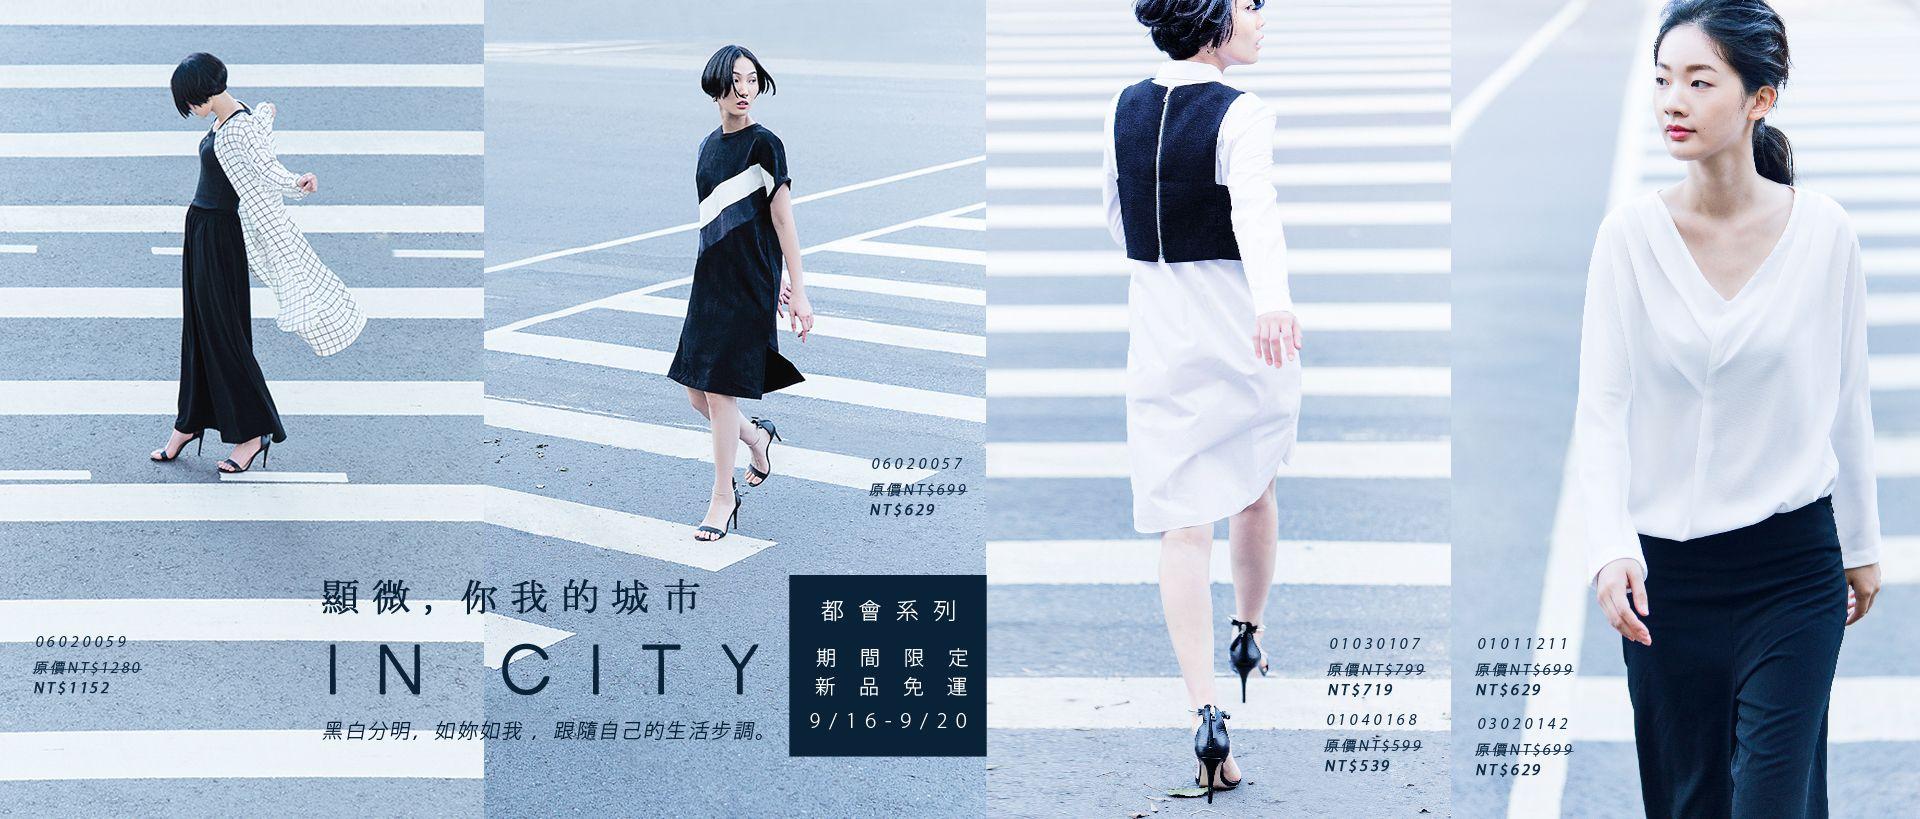 Web design japan style dress